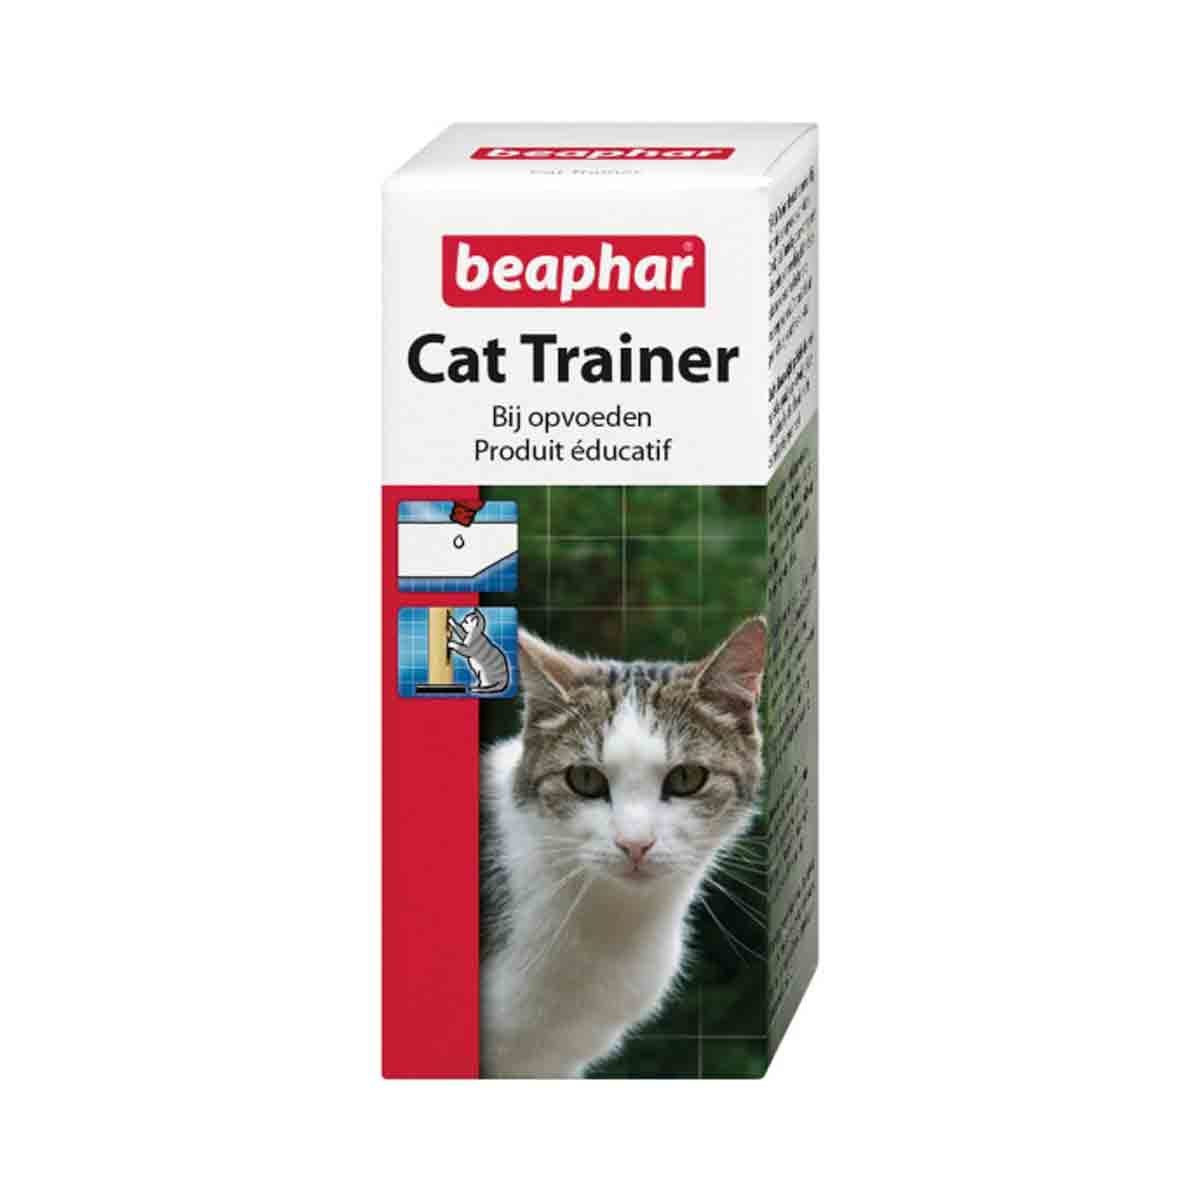 Beaphar Cat Trainer 10 ml